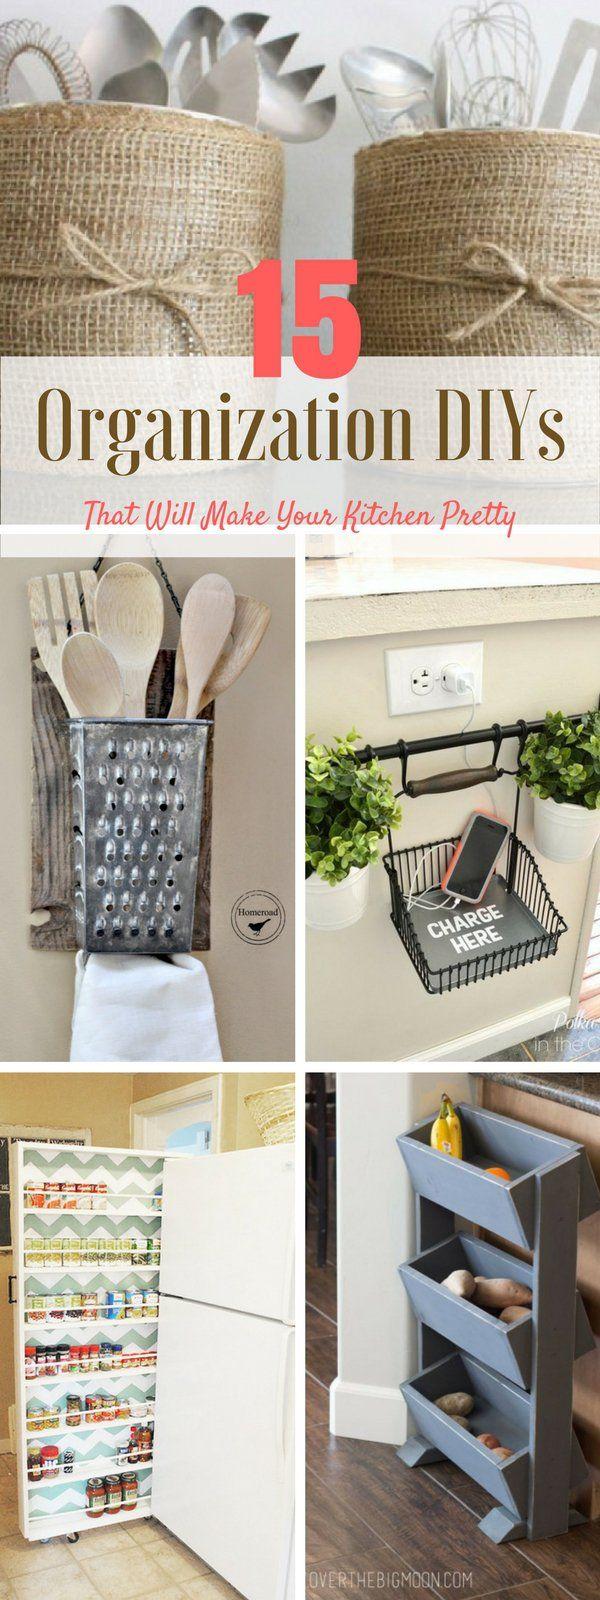 Check out the 15 kitchen organization DIYs @istandarddesign